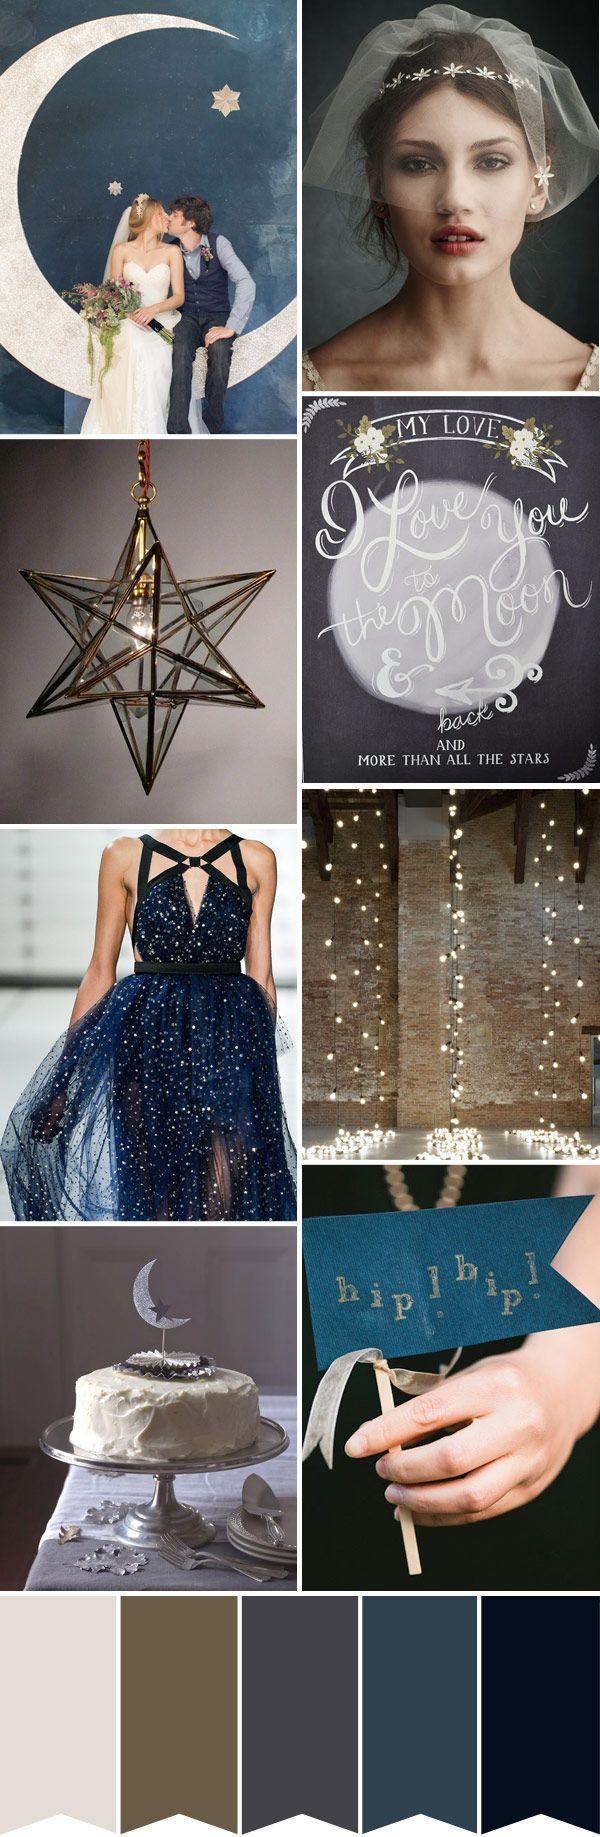 Star-and-Moon-Wedding-Inspiration. Read More - http://onefabday.com/love-moon-starry-night-wedding-inspiration/